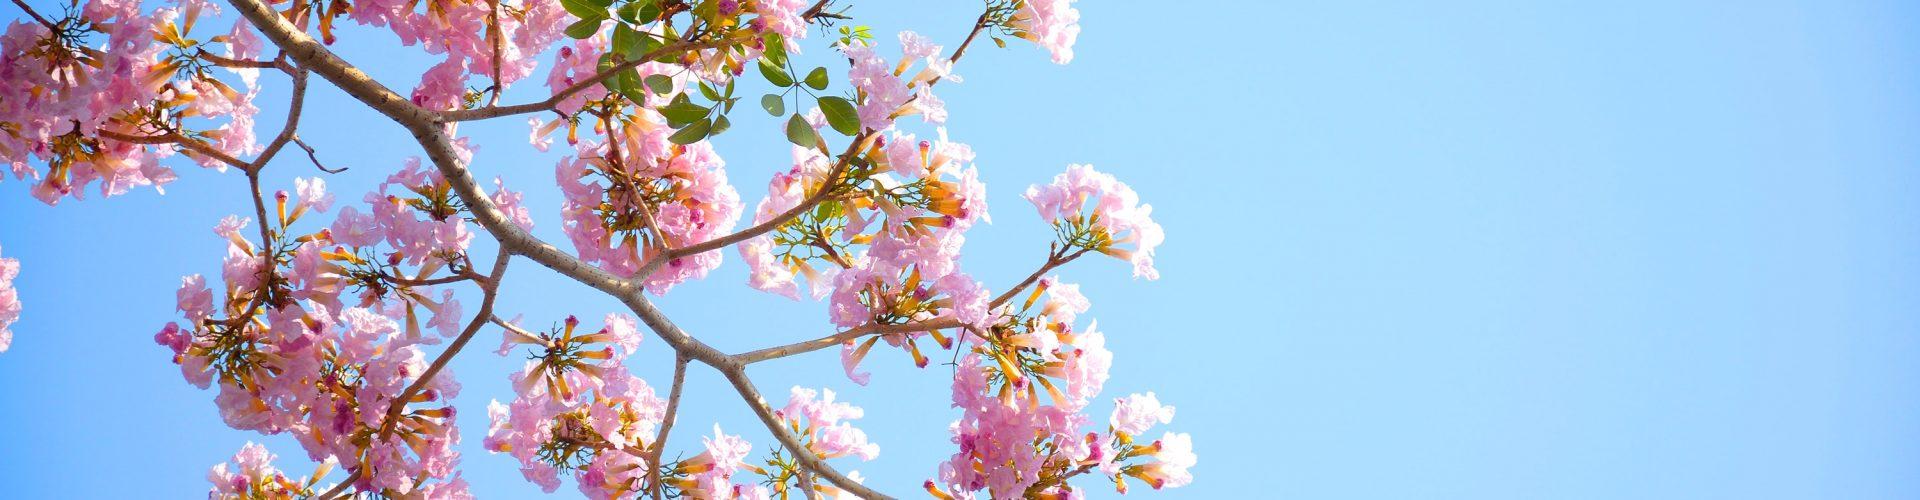 bloom-blossom-flora-96654